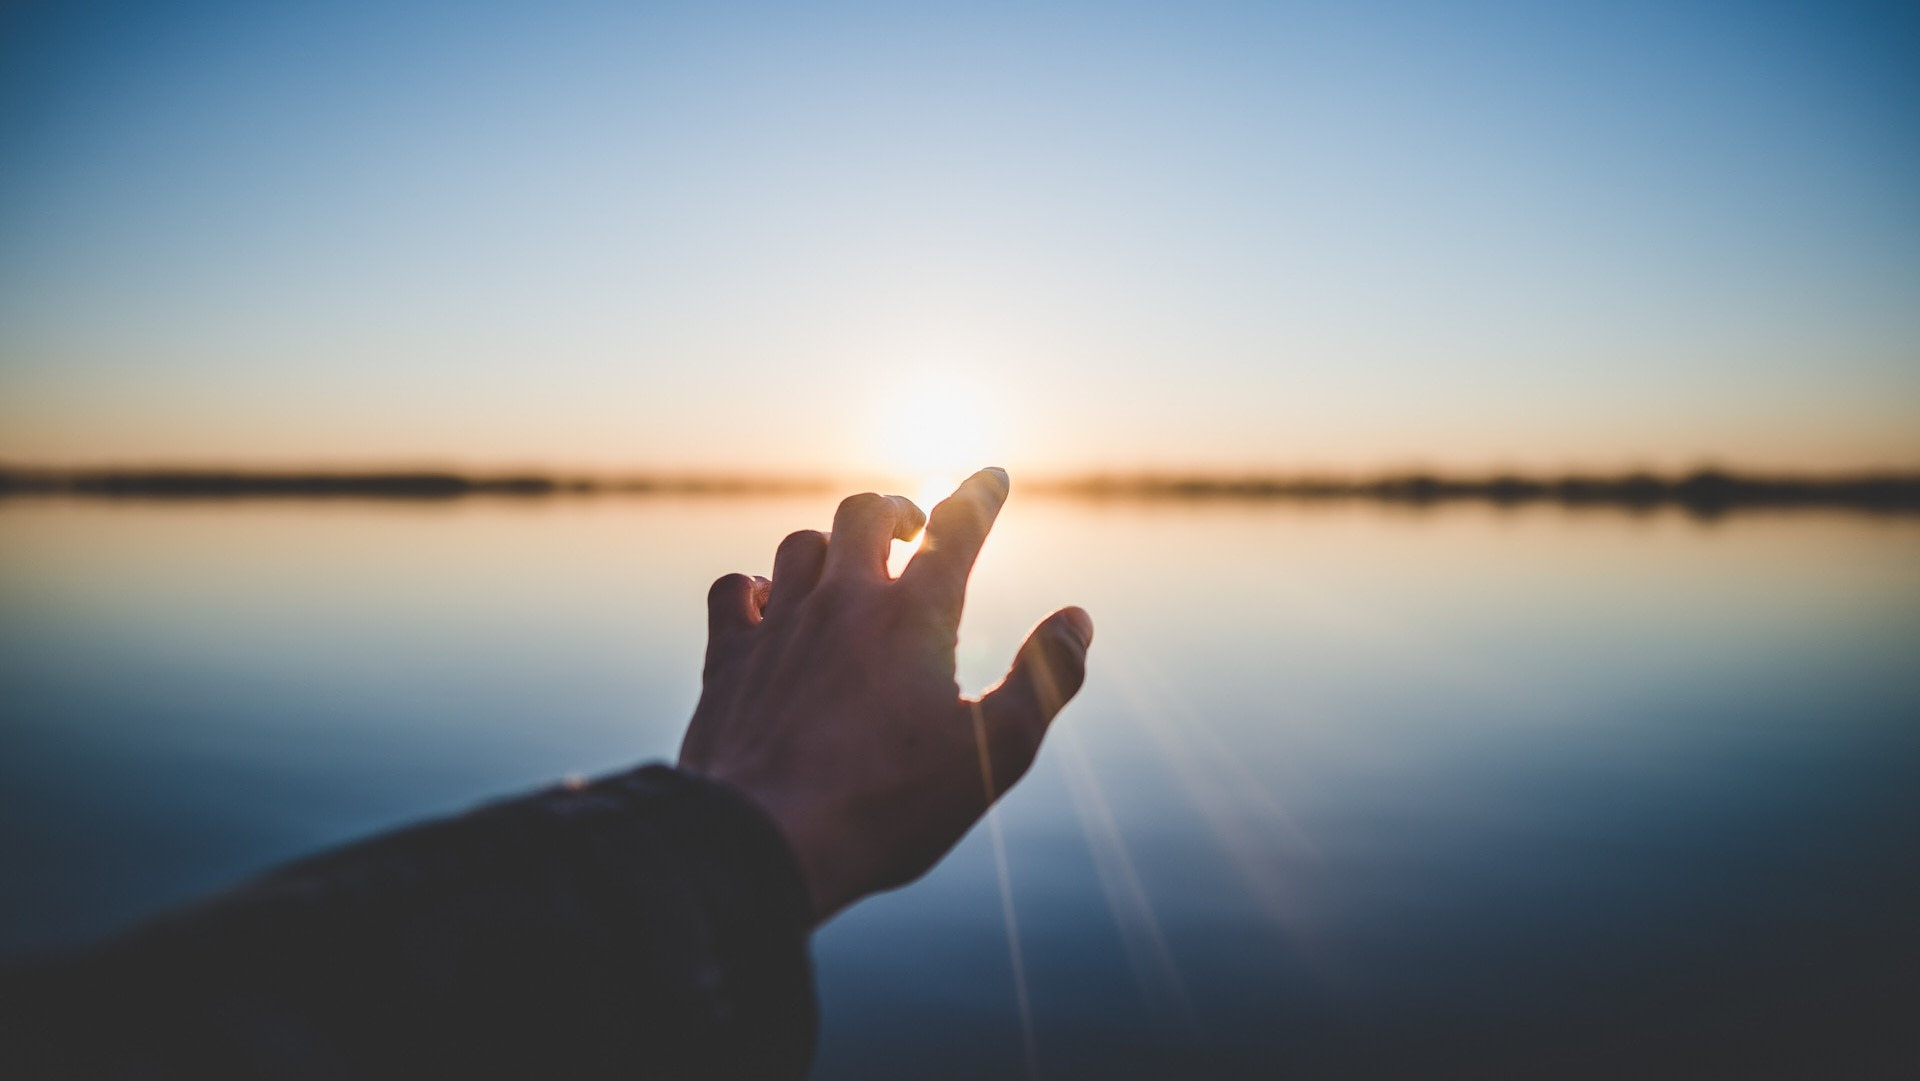 person extending their hand toward the sun near a body of water.